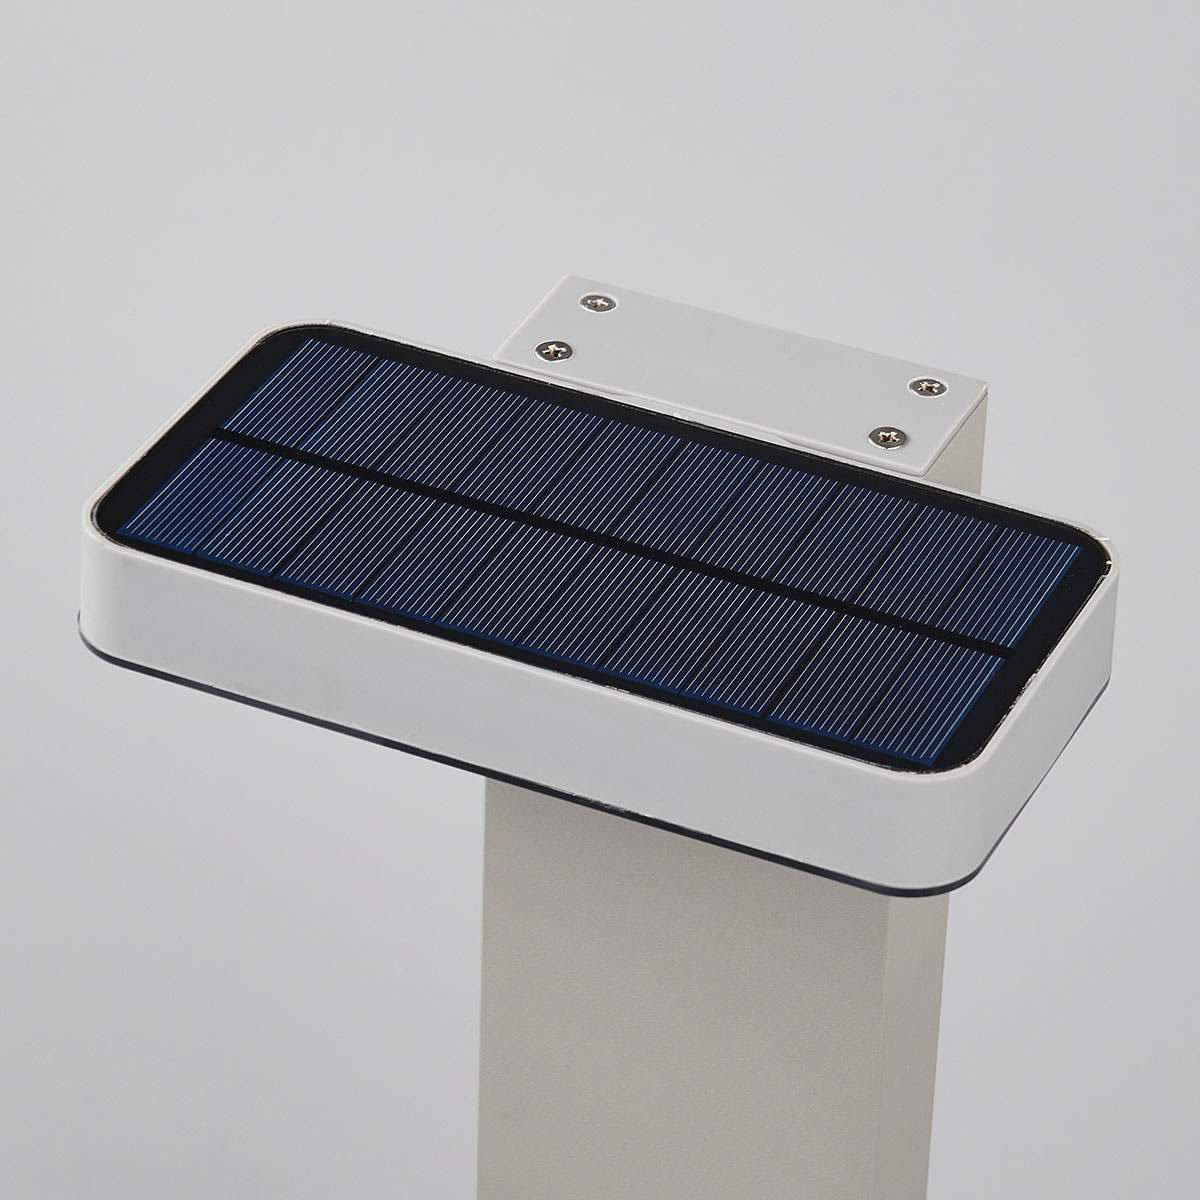 LED-Sockelleuchte Maik mit Bewegungsmelder, 60x18x13 cm, Kunststoff,  grau | #5